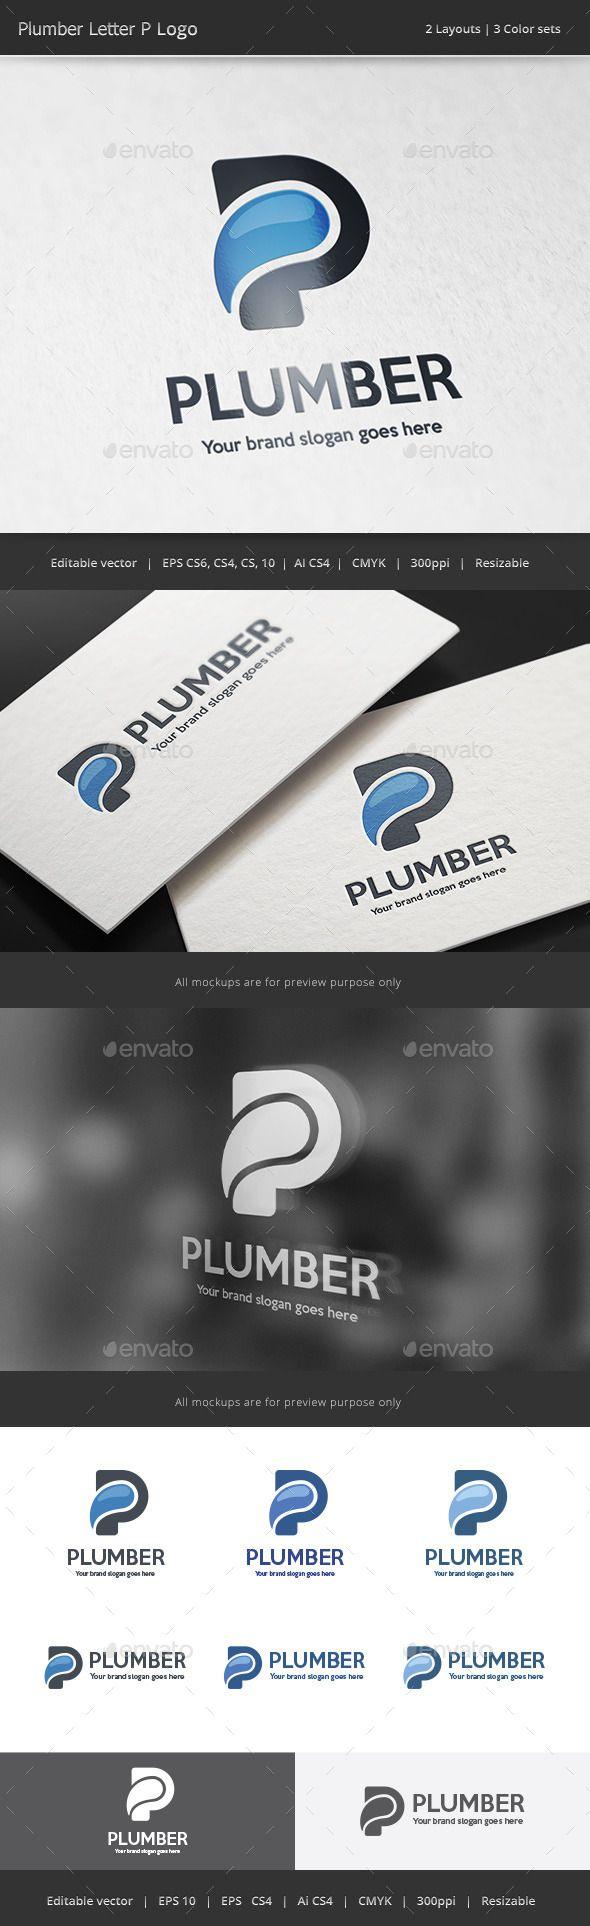 73 Best Van Designs Images On Pinterest Design Logos Design Web